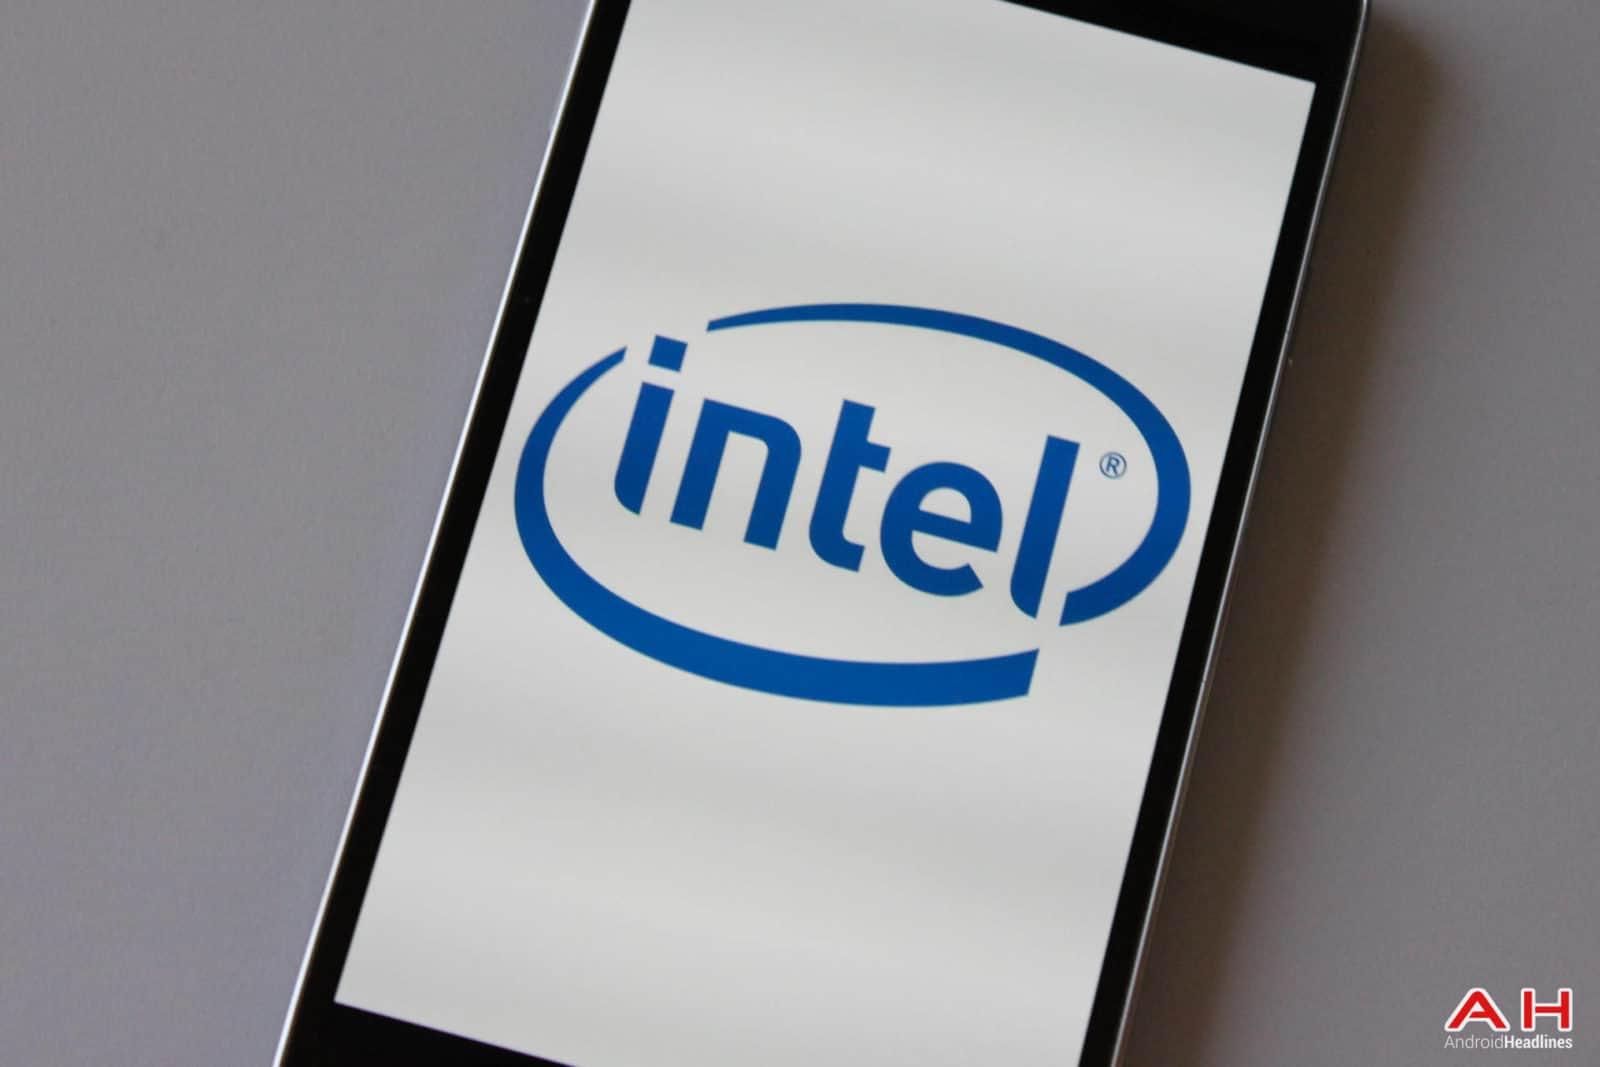 AH Intel Logo 1.0